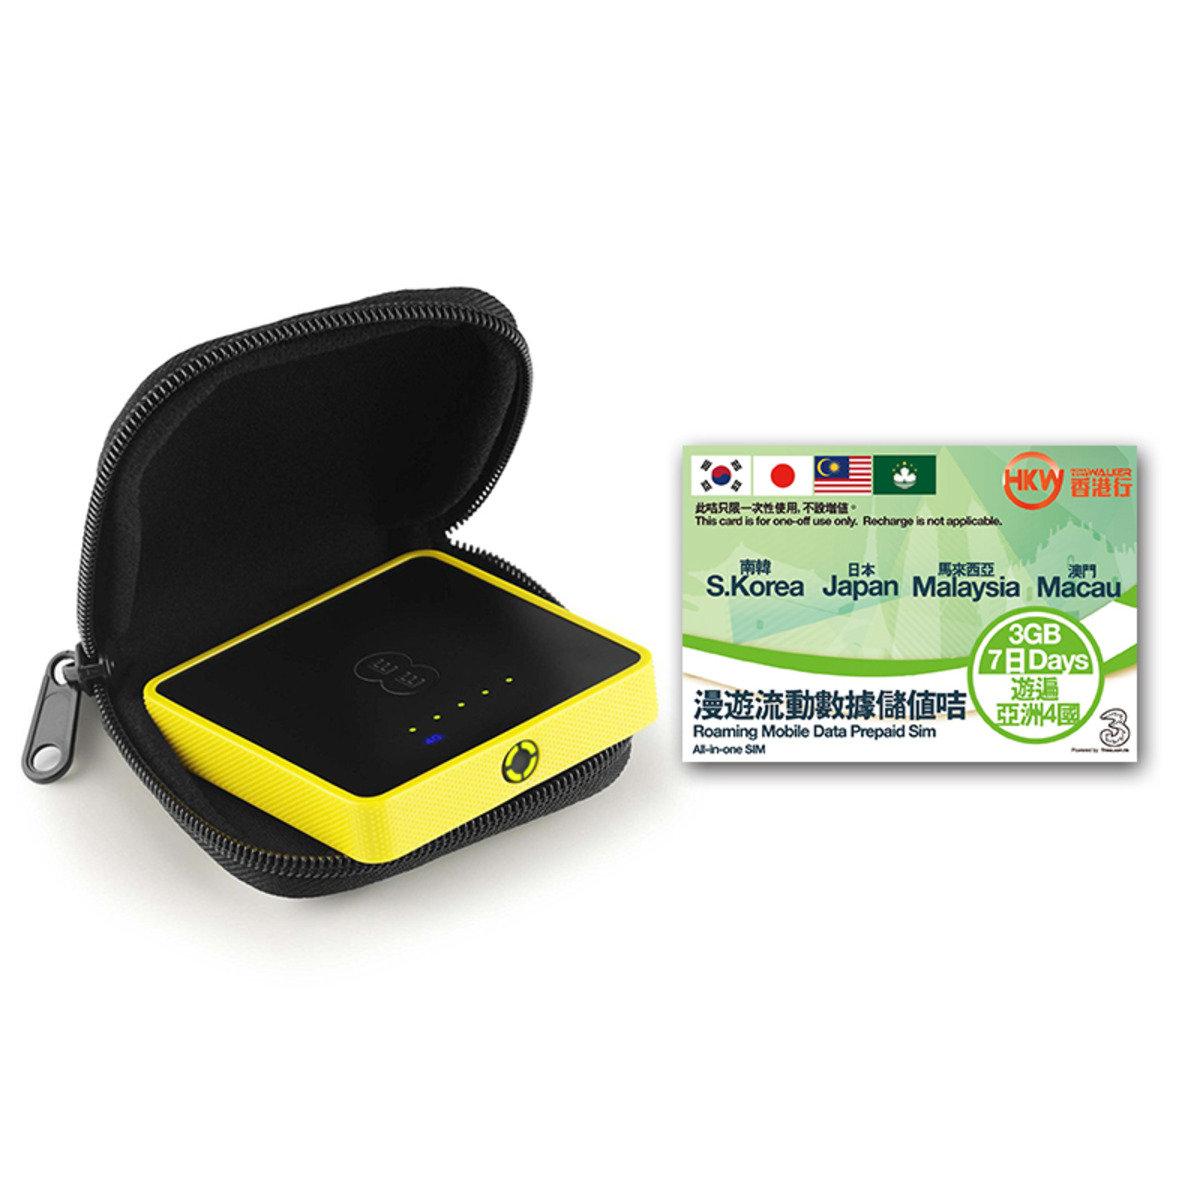 HKWALKER Osprey 2 Mini Wifi蛋 + 7天3GB prepaid sim亞洲漫遊數據儲值咭 (expiry date:31-12-2017)